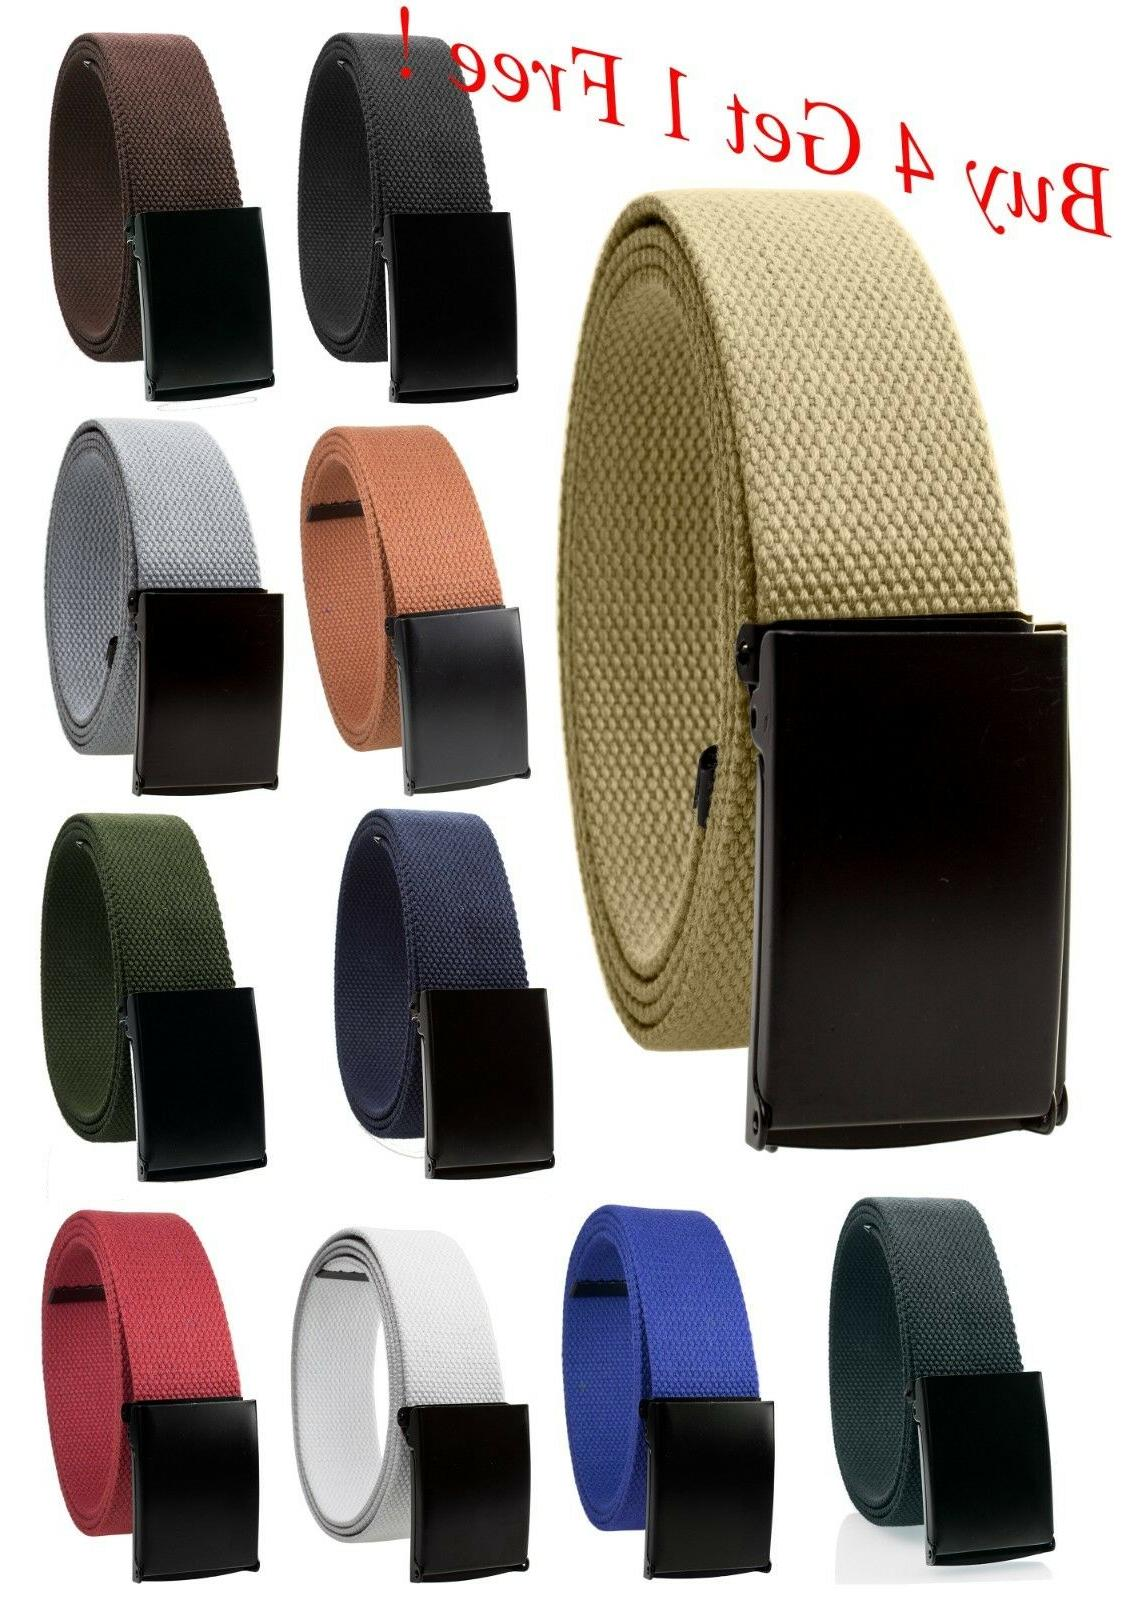 Unisex Fully Adjustable Canvas Web Belt with Black Flip Top